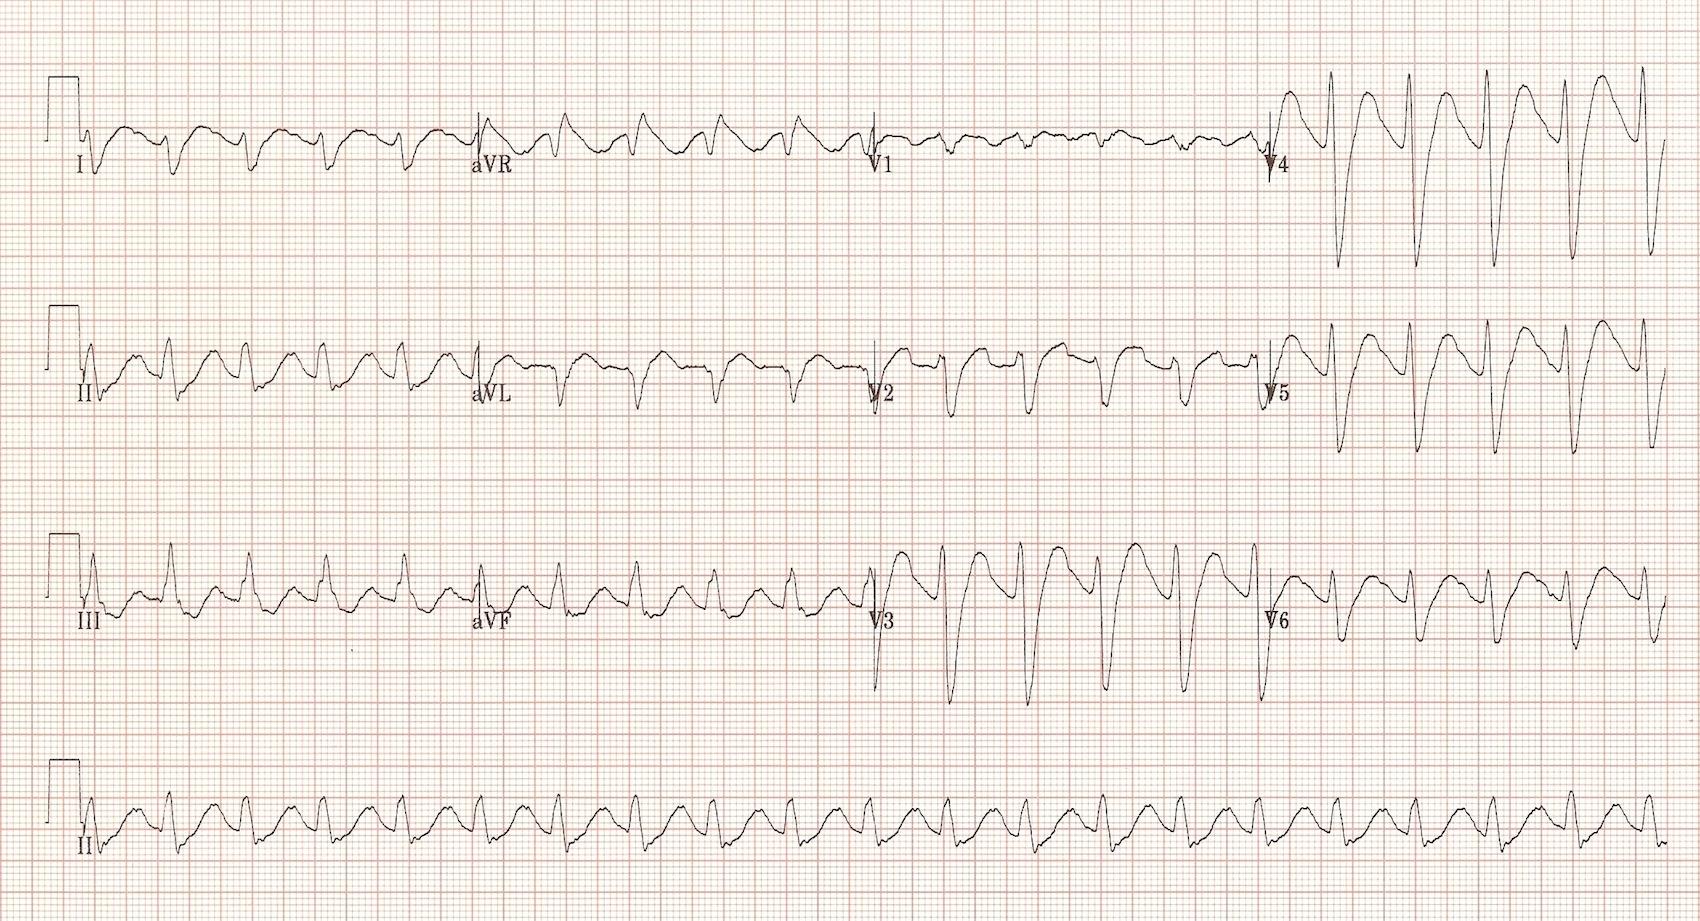 TCA Induced Cardiotoxicity